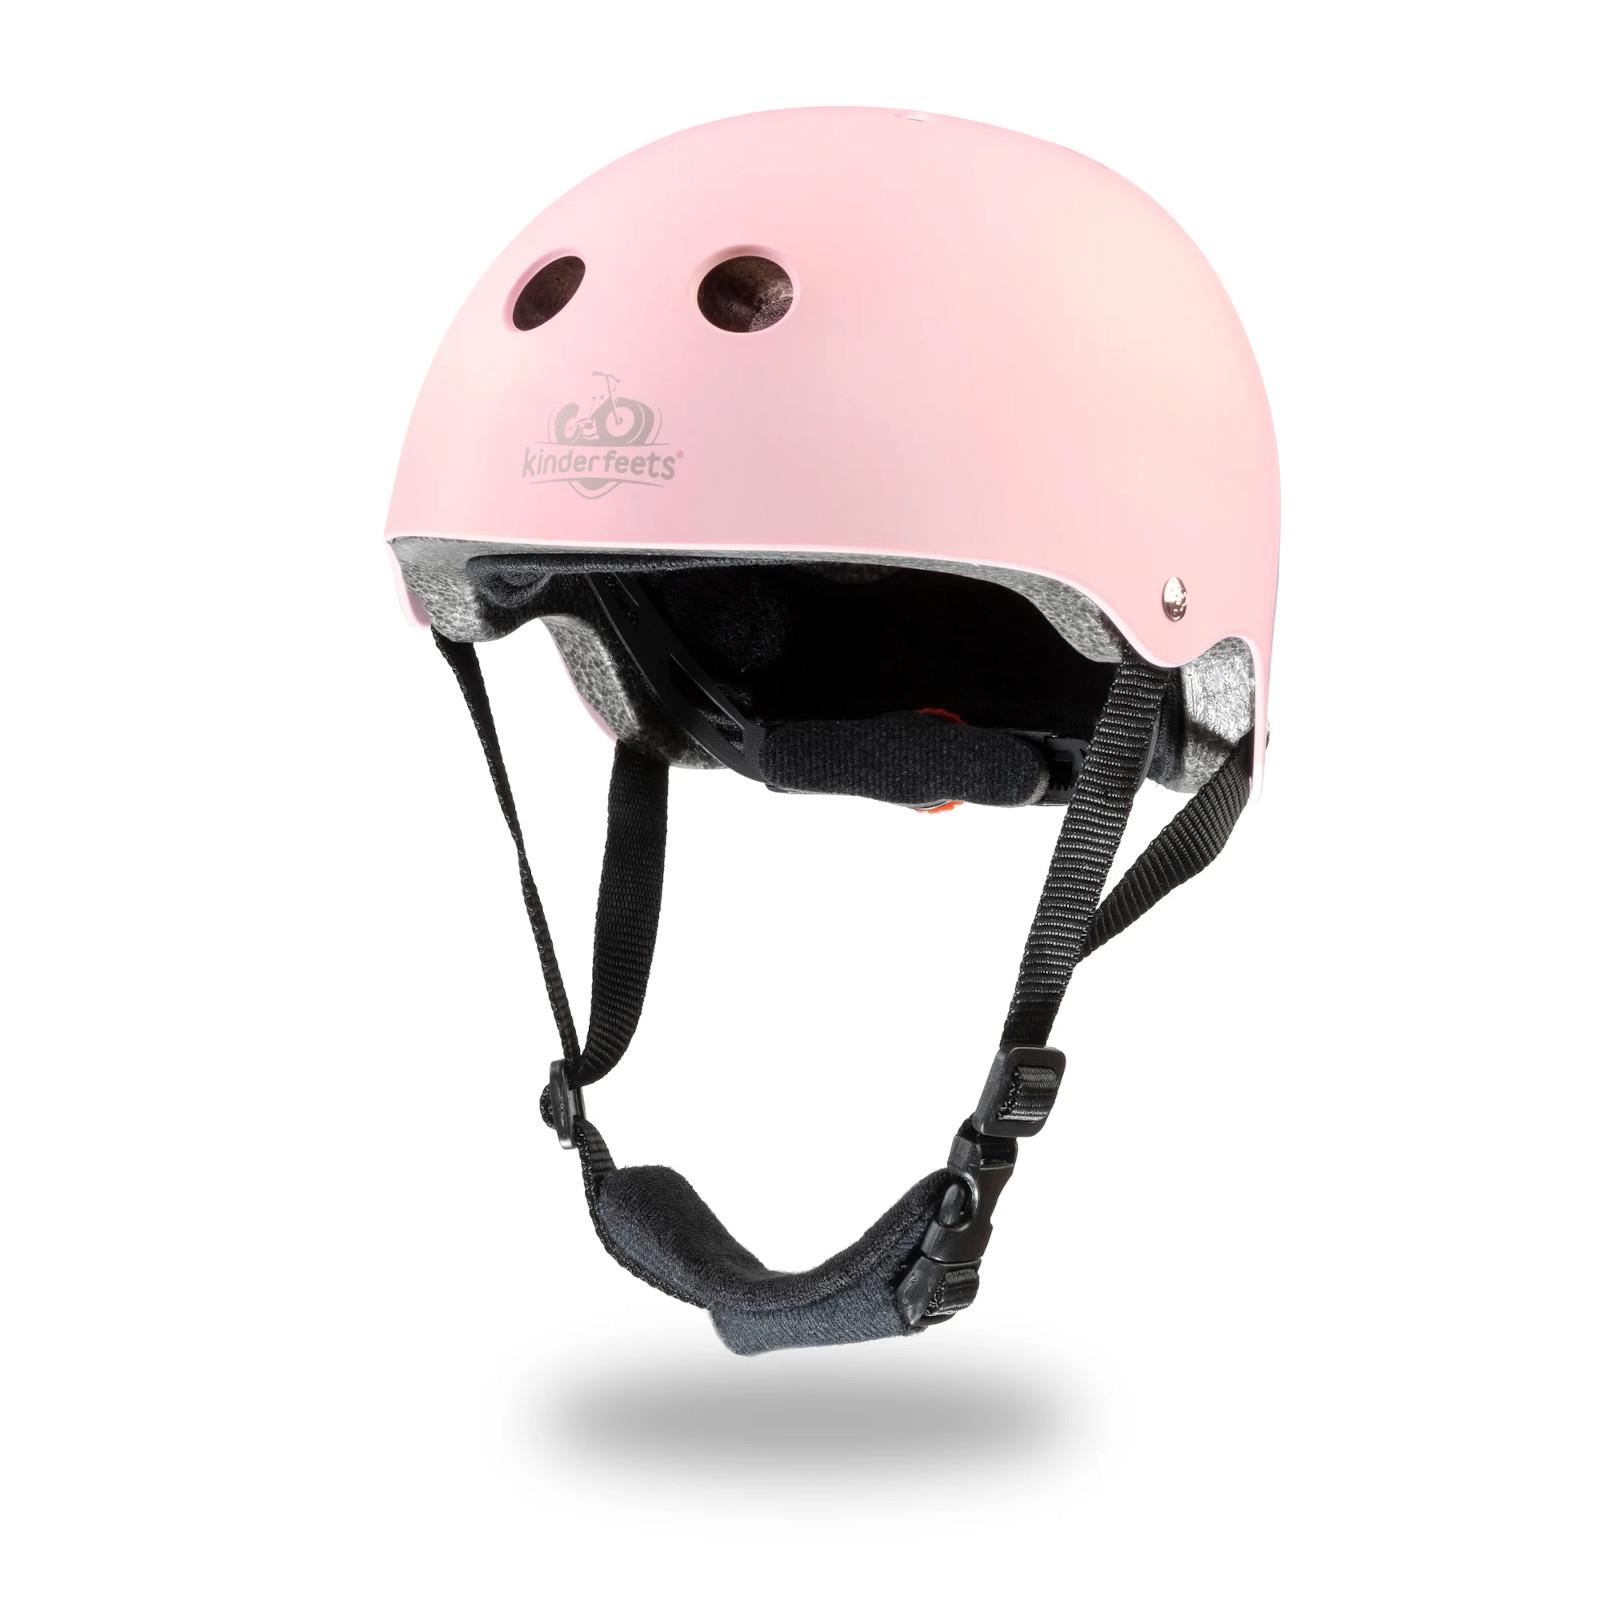 Kaciga za bicikl Kinderfeets matte pink